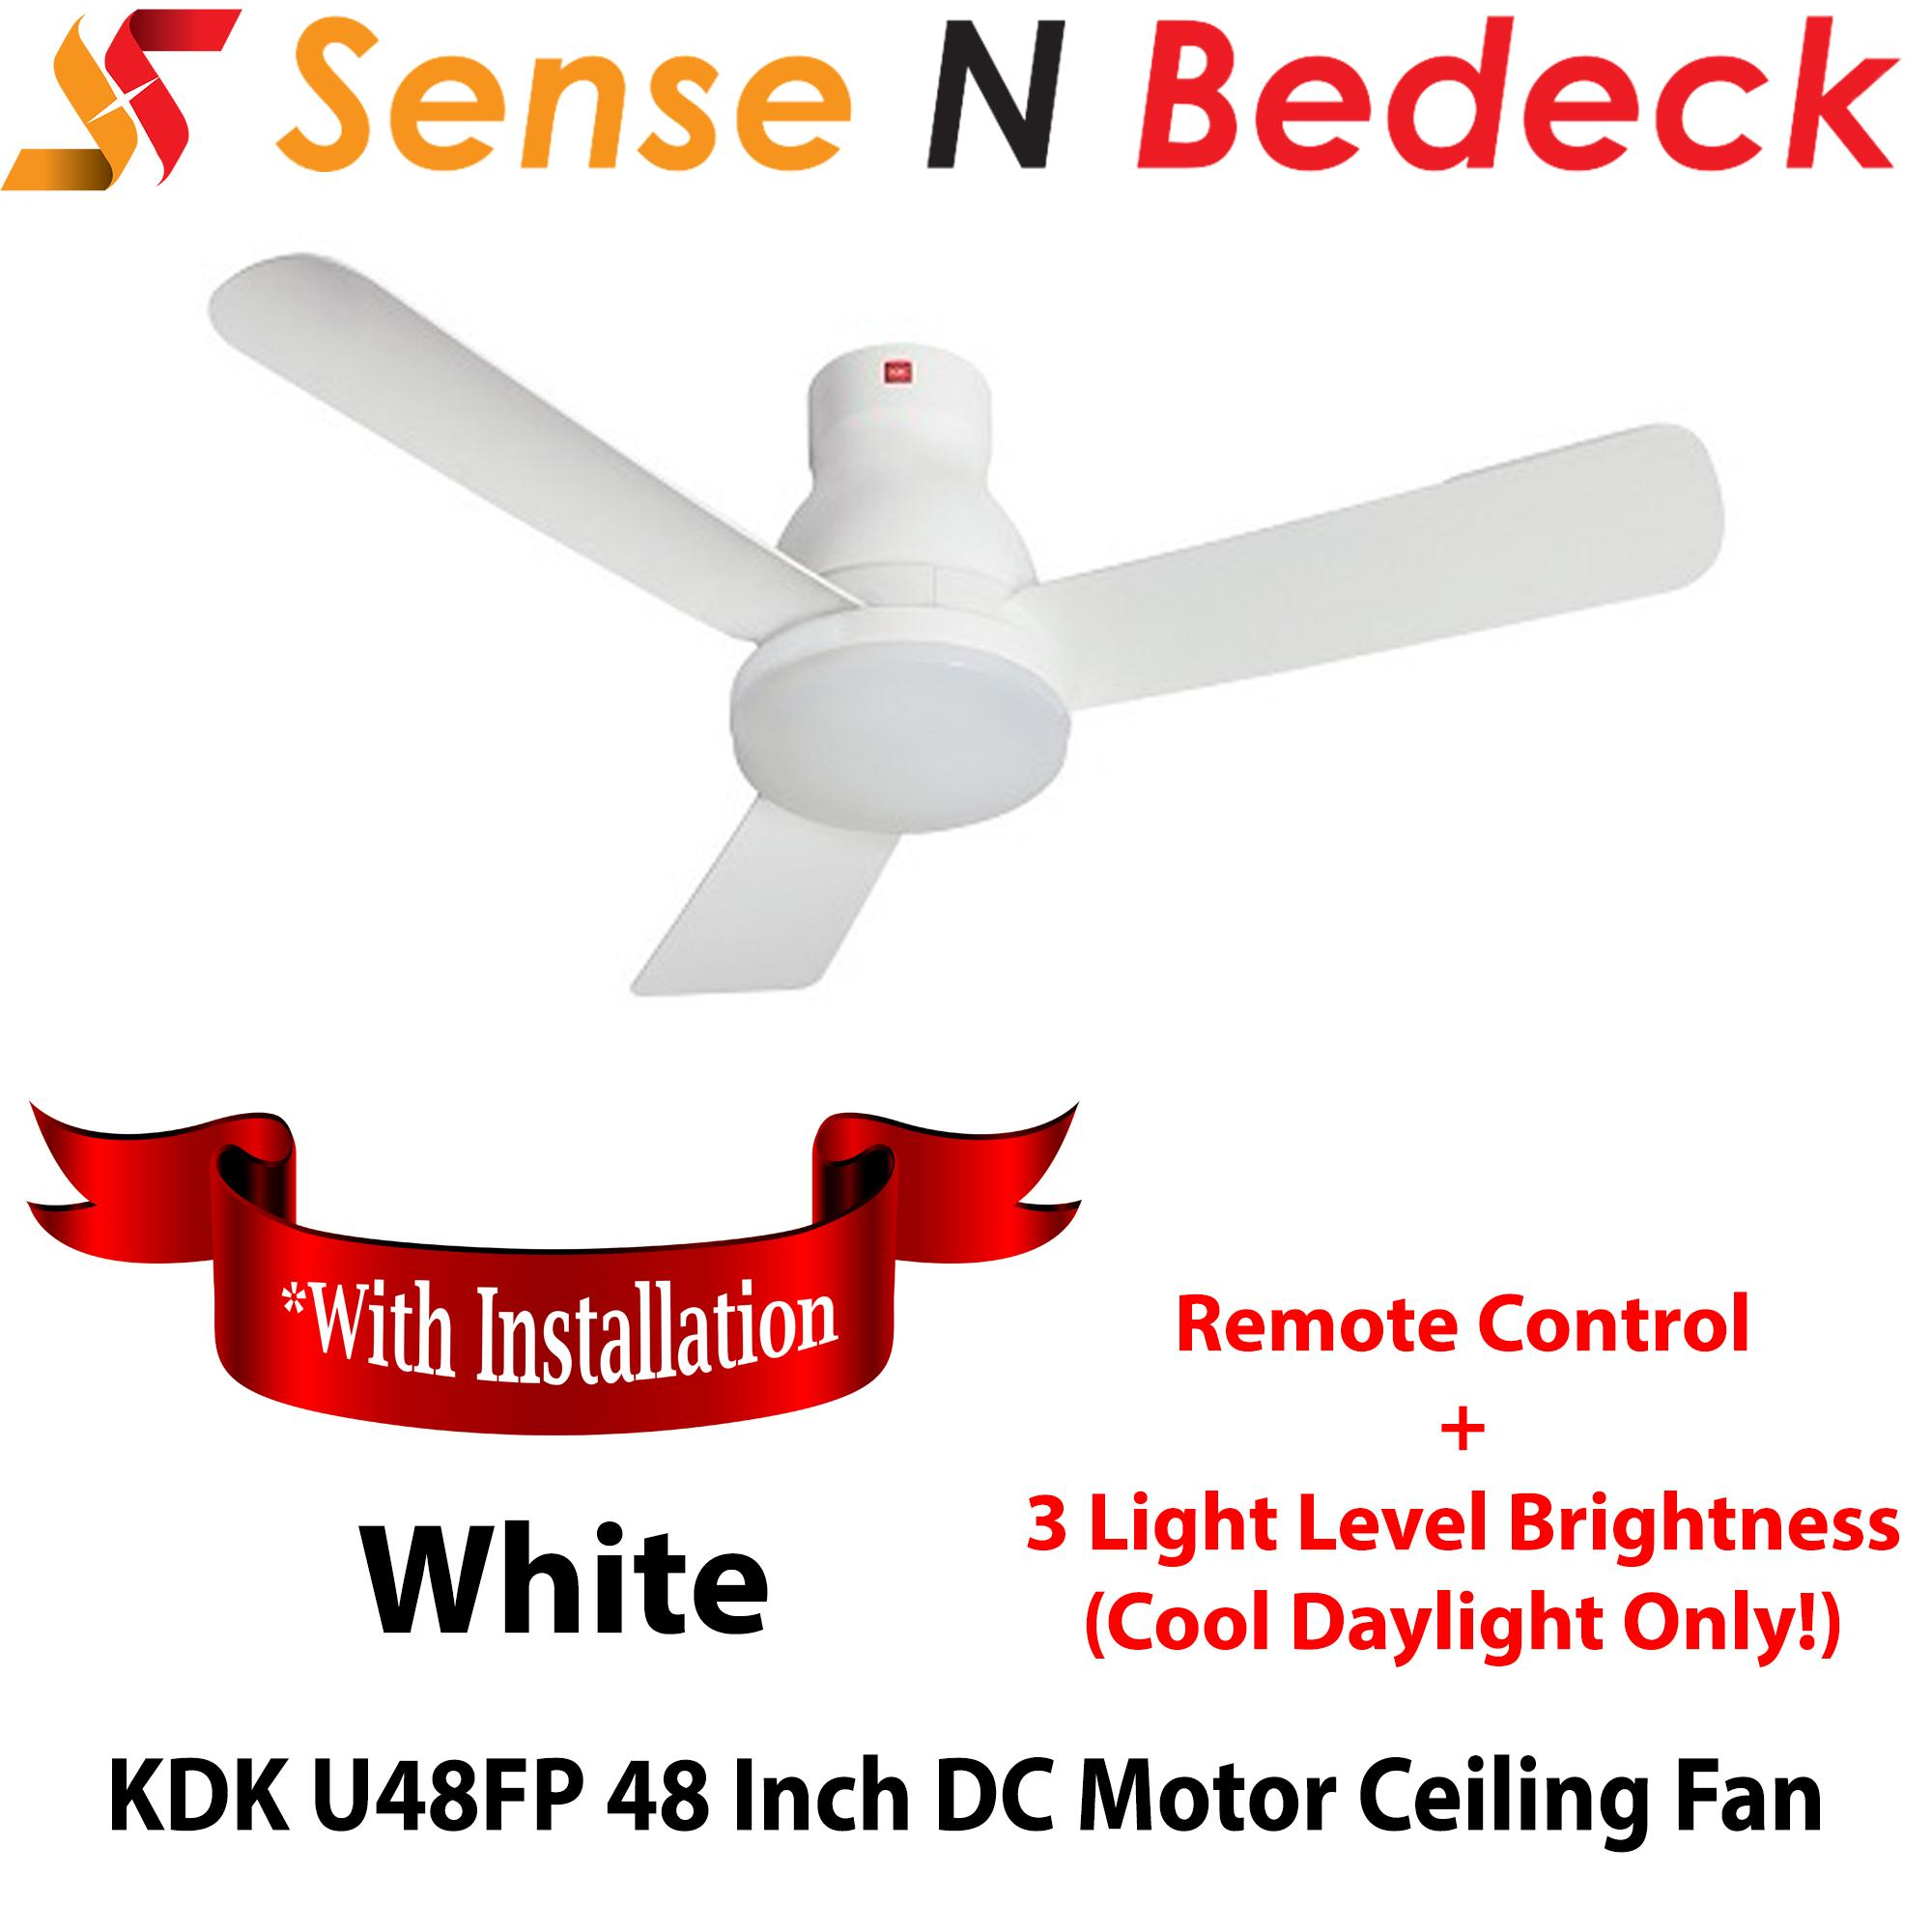 KDK U48FP 48 Inch LED DC Motor Ceiling Fan *With installation